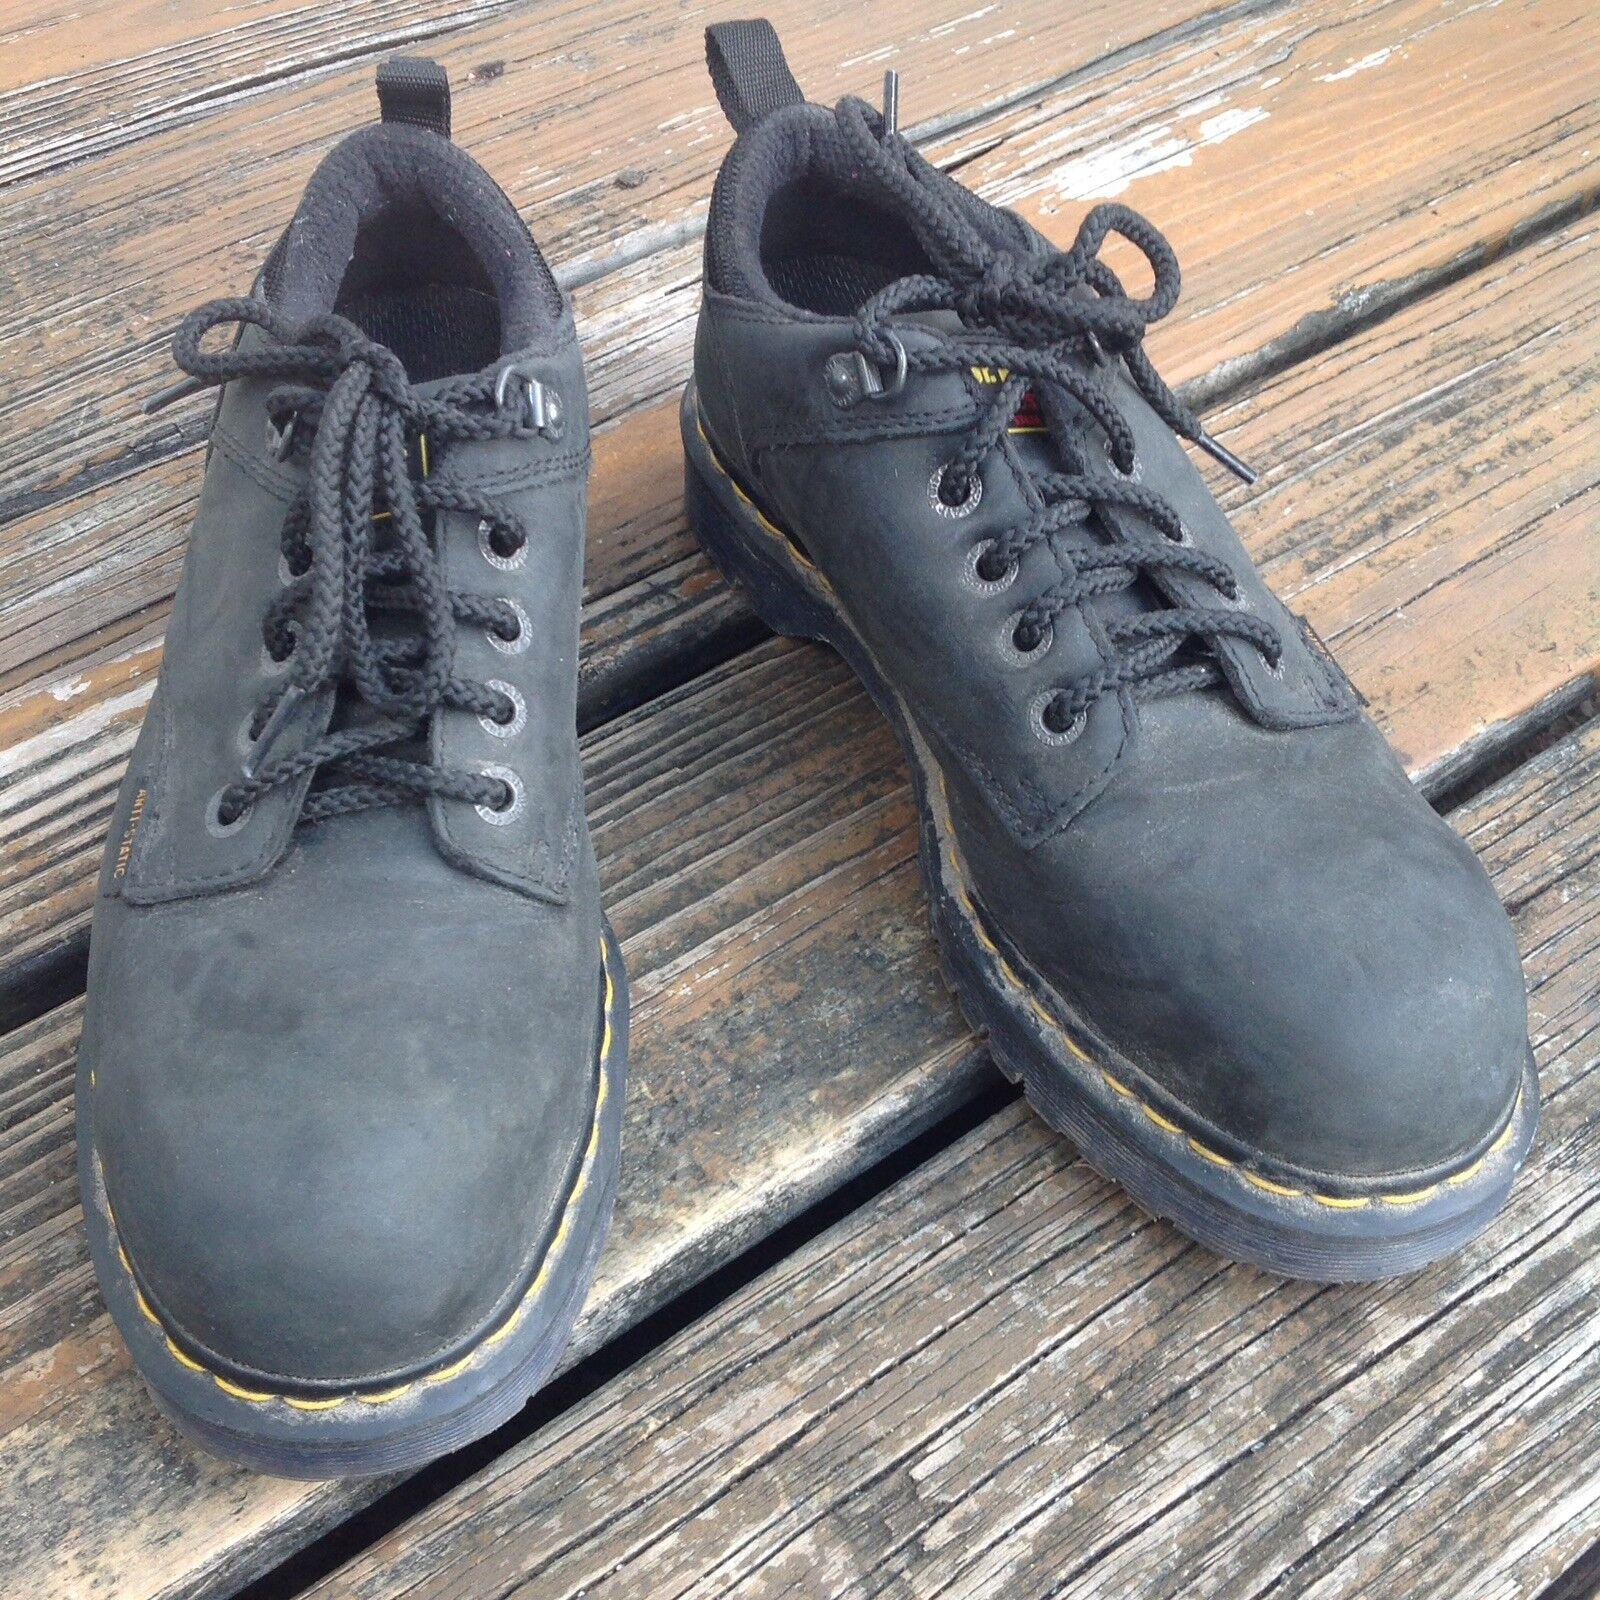 Dr Martens Docs Black Oxford Leather Steel Toe shoes Mens 10 Womens 11 EU 43 UK9